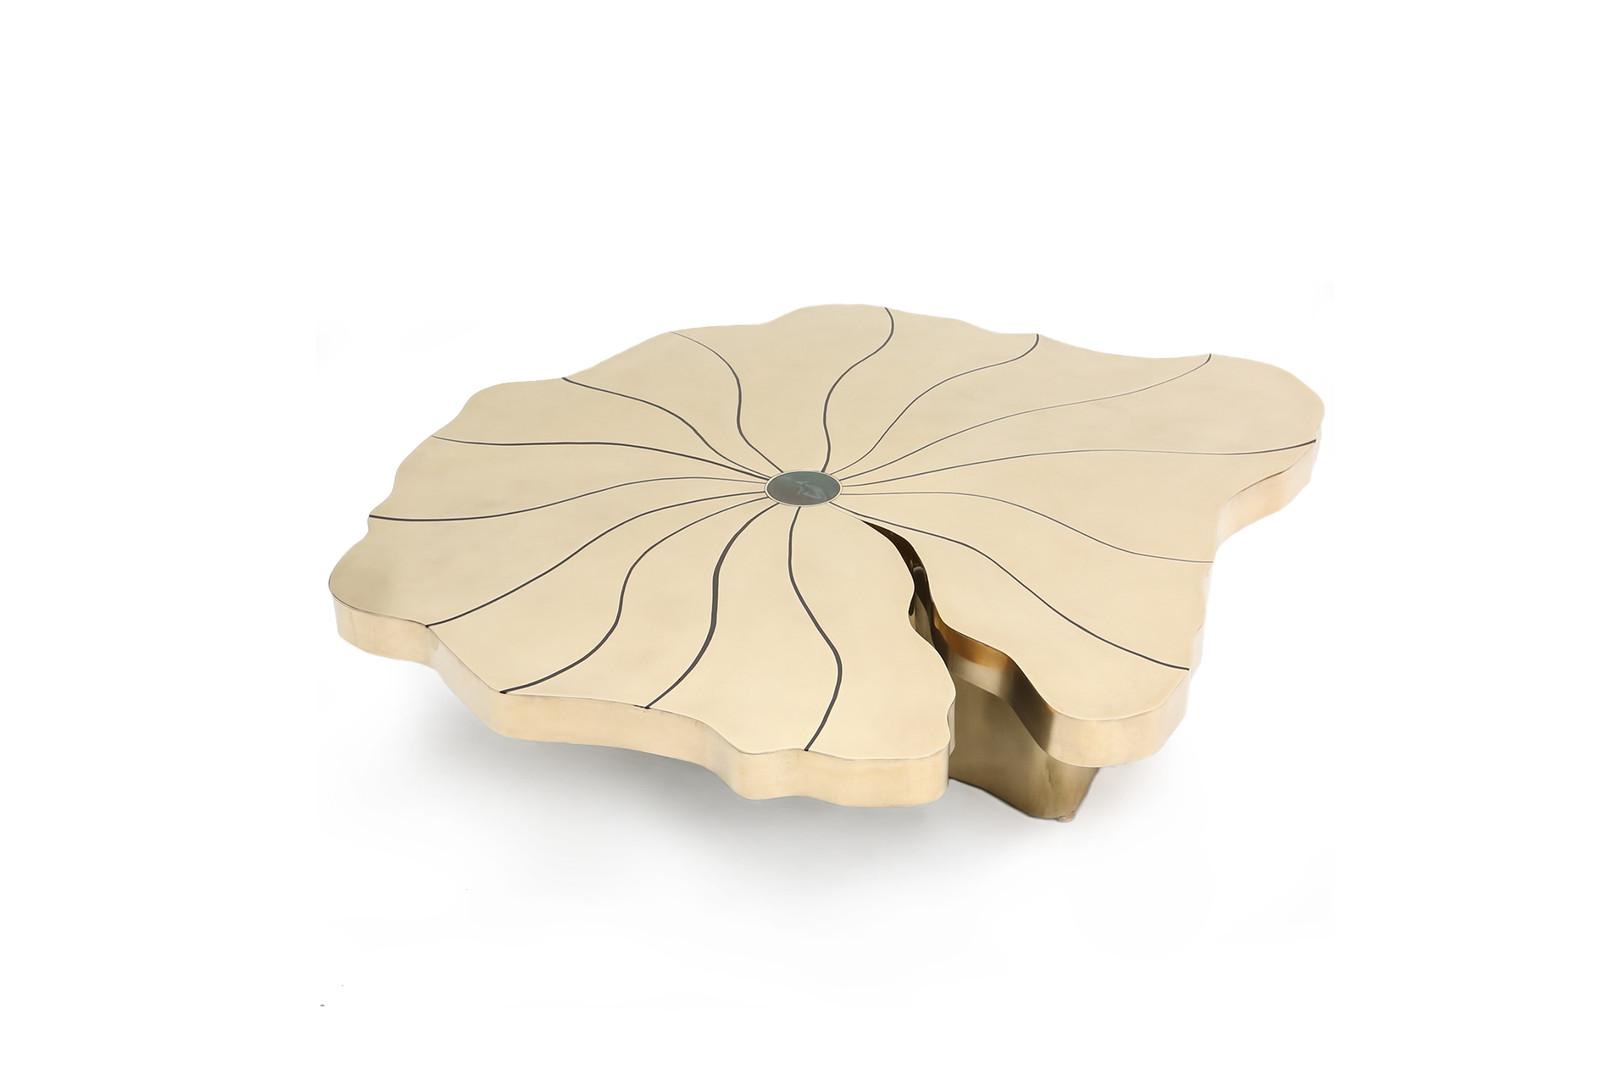 dessauvage-goldwood-by-boris-antwerpen-4